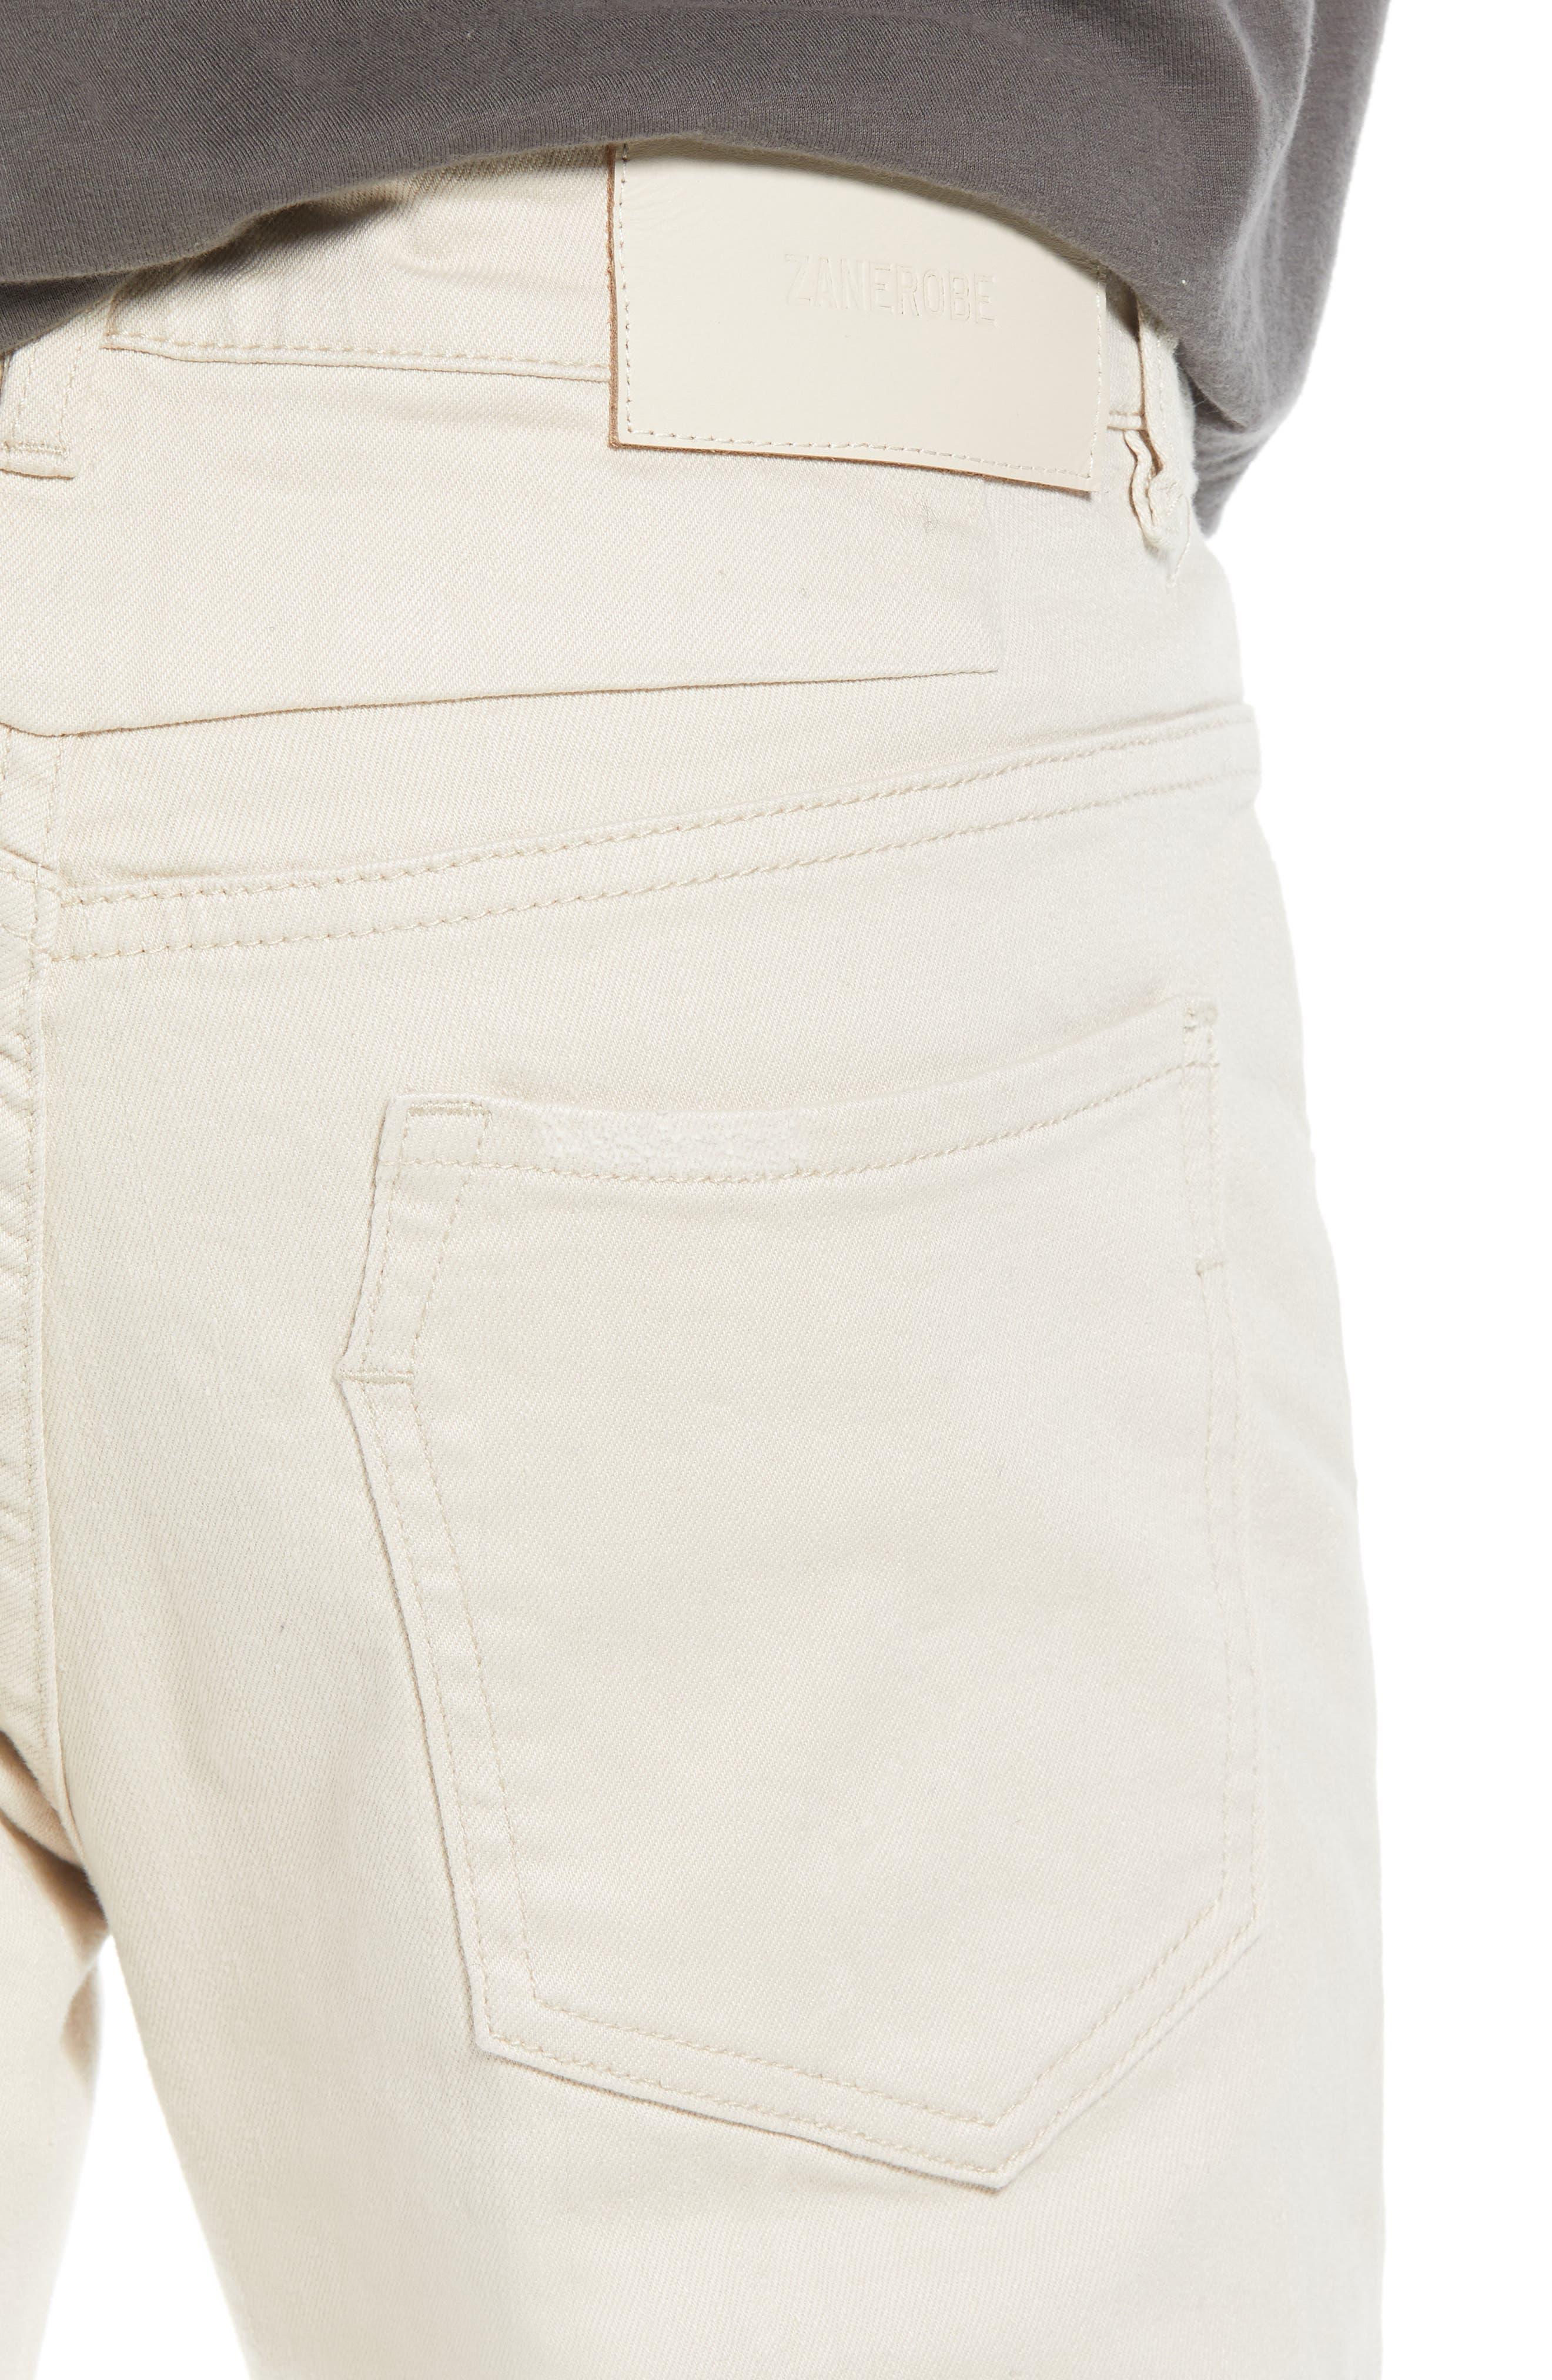 Joe Blow Slim Fit Jeans,                             Alternate thumbnail 4, color,                             901